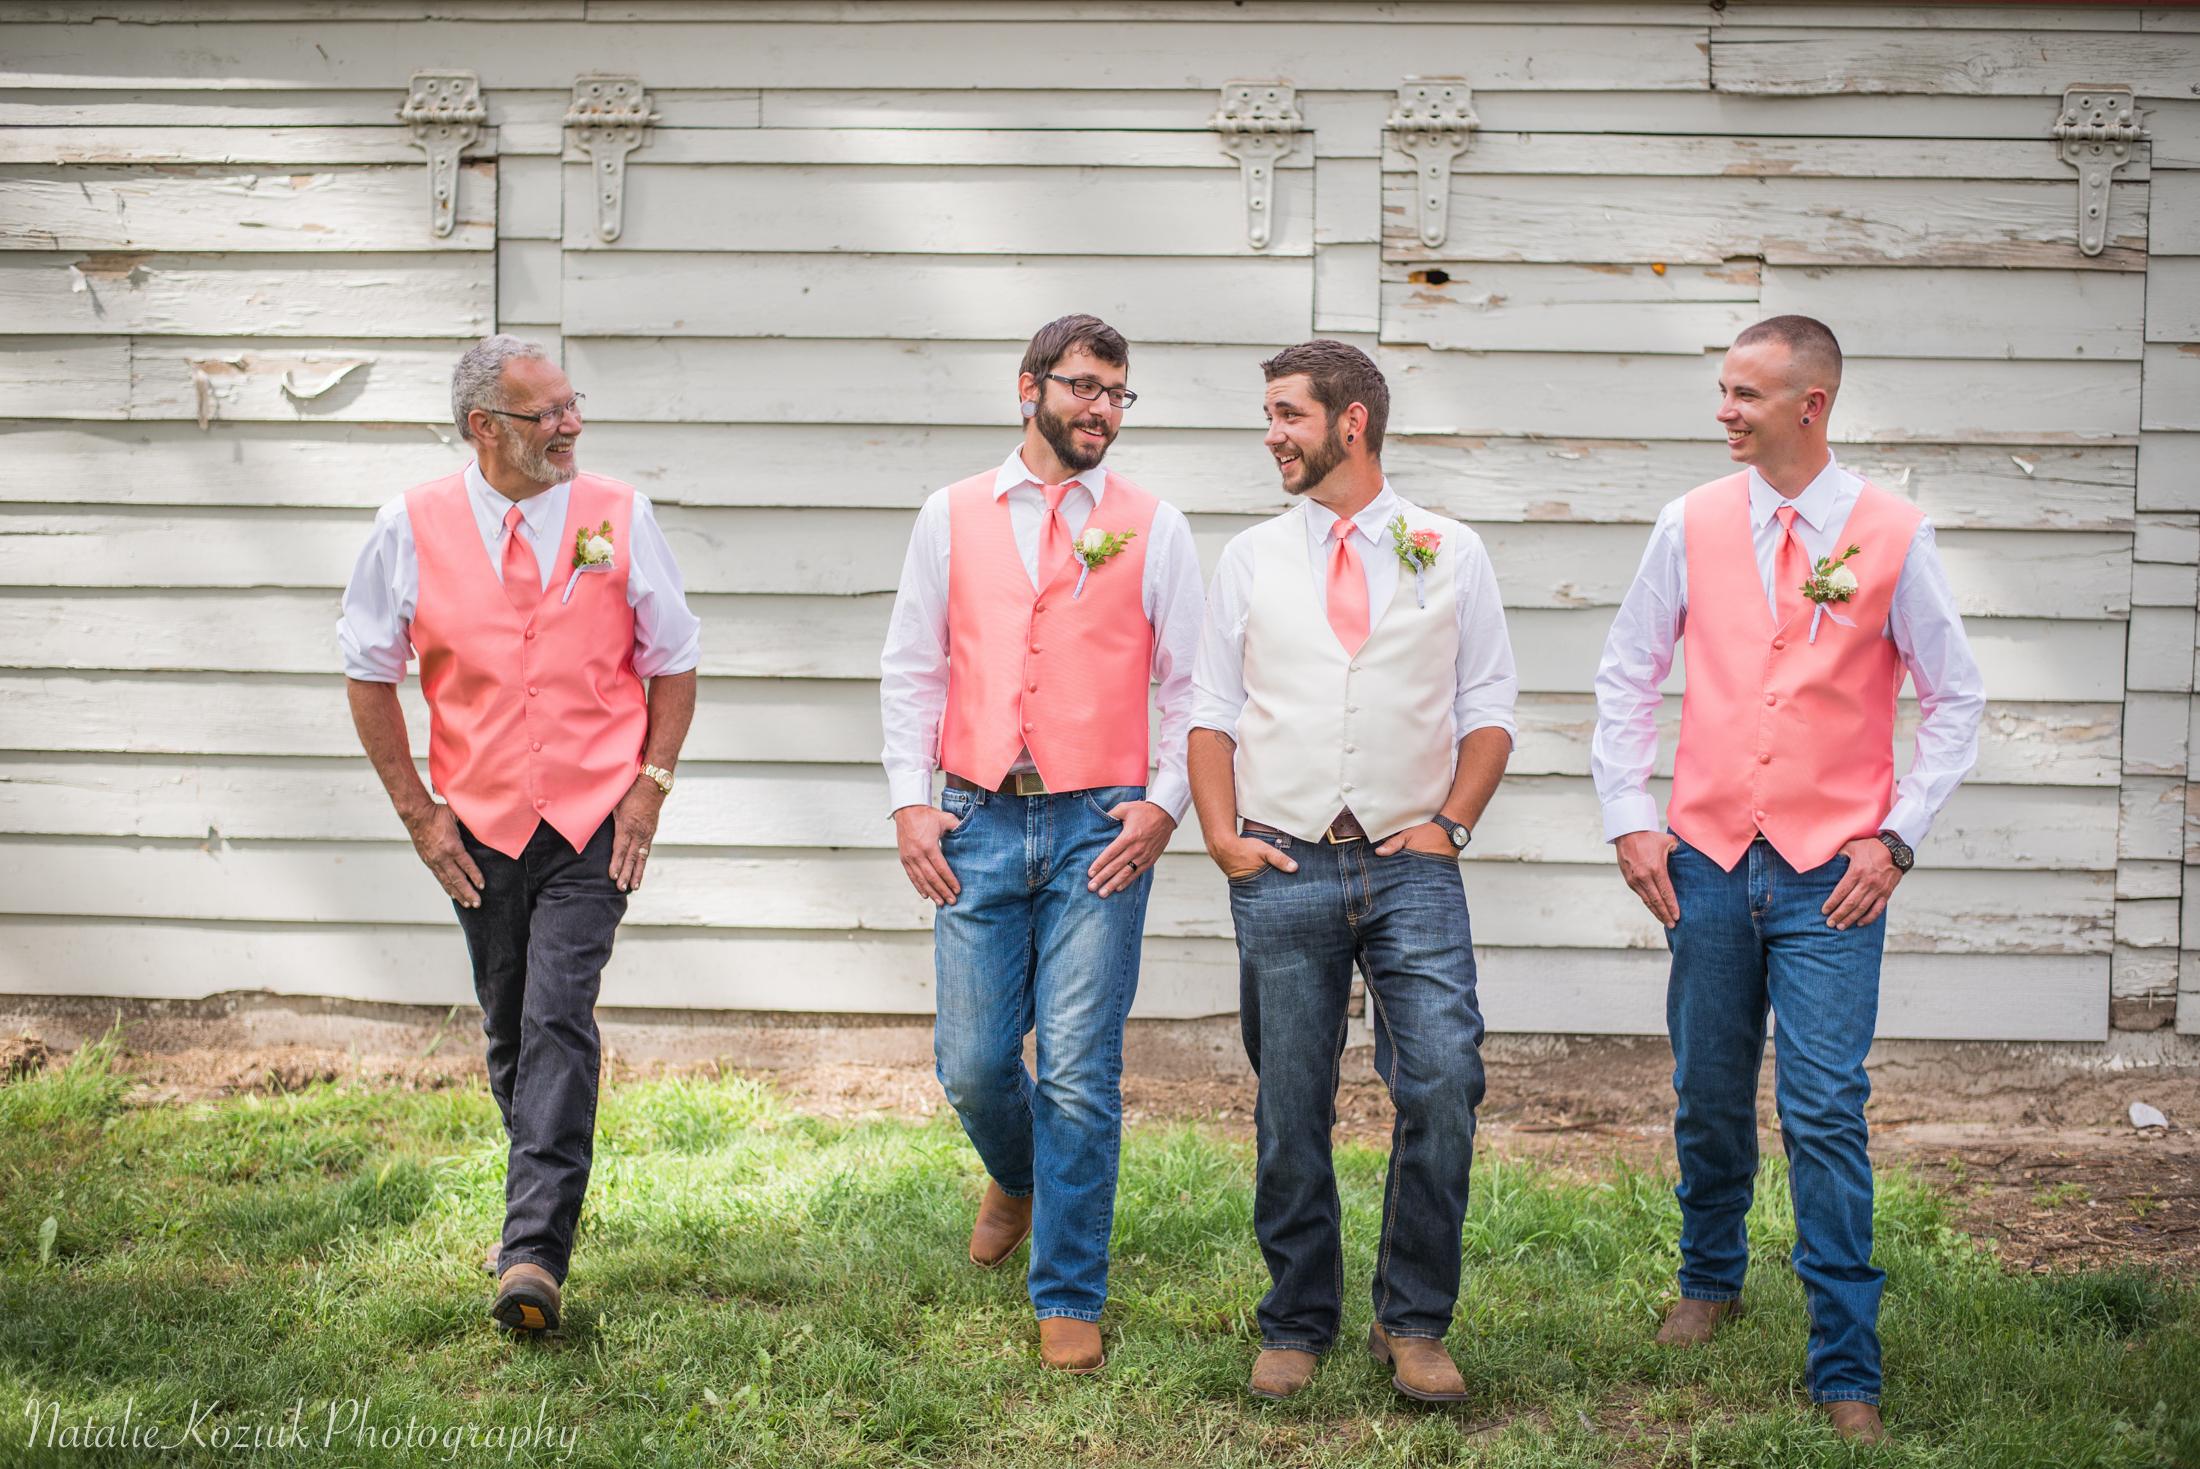 Natalie Koziuk Photography | Boise wedding photographer | bridal party | Star, ID | Bride Groom | nkoziukphotography.com